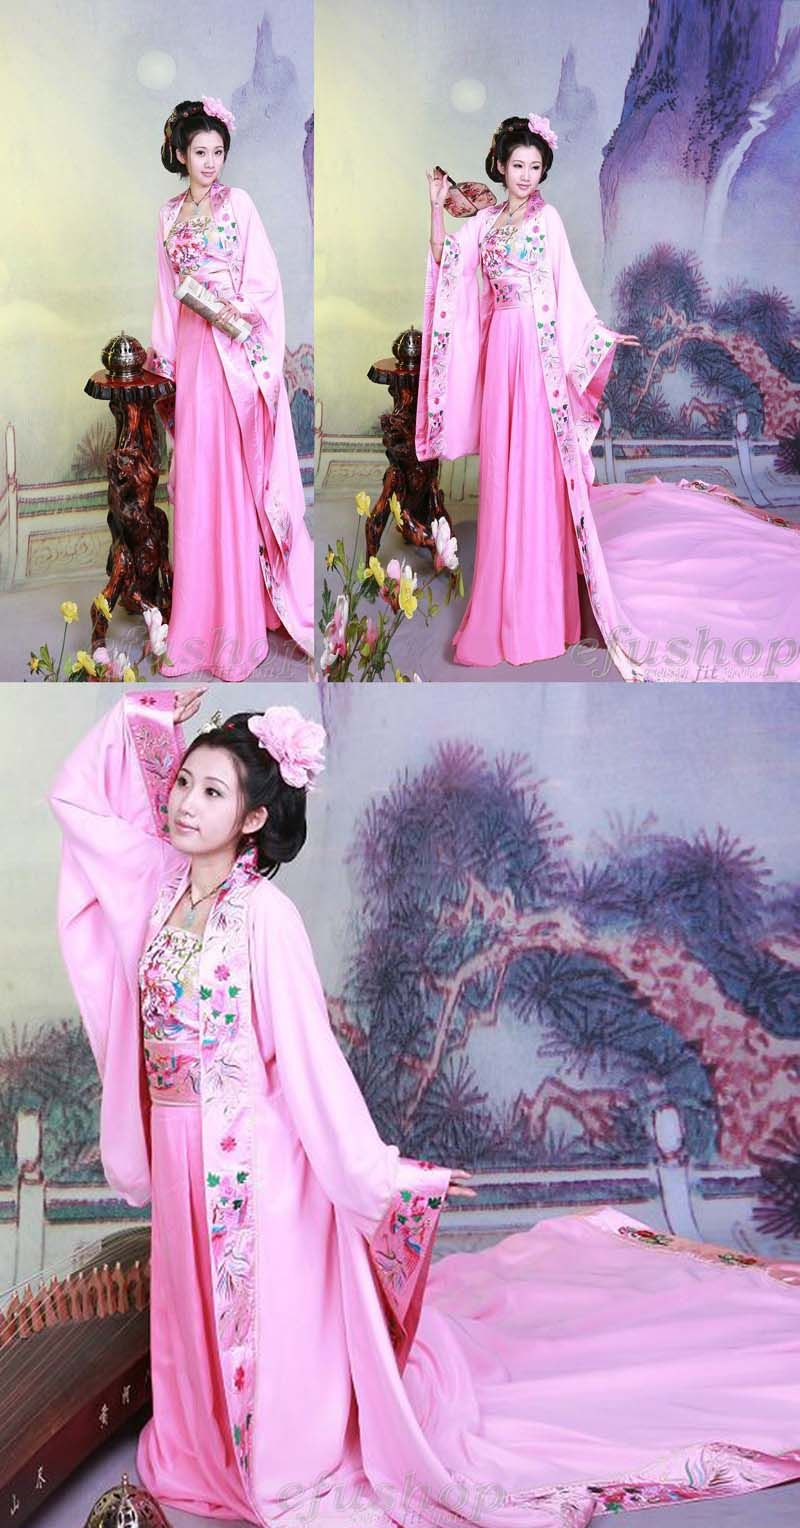 Pin de Ágnes Békéssy en hanfu | Pinterest | Vestidos diferentes ...